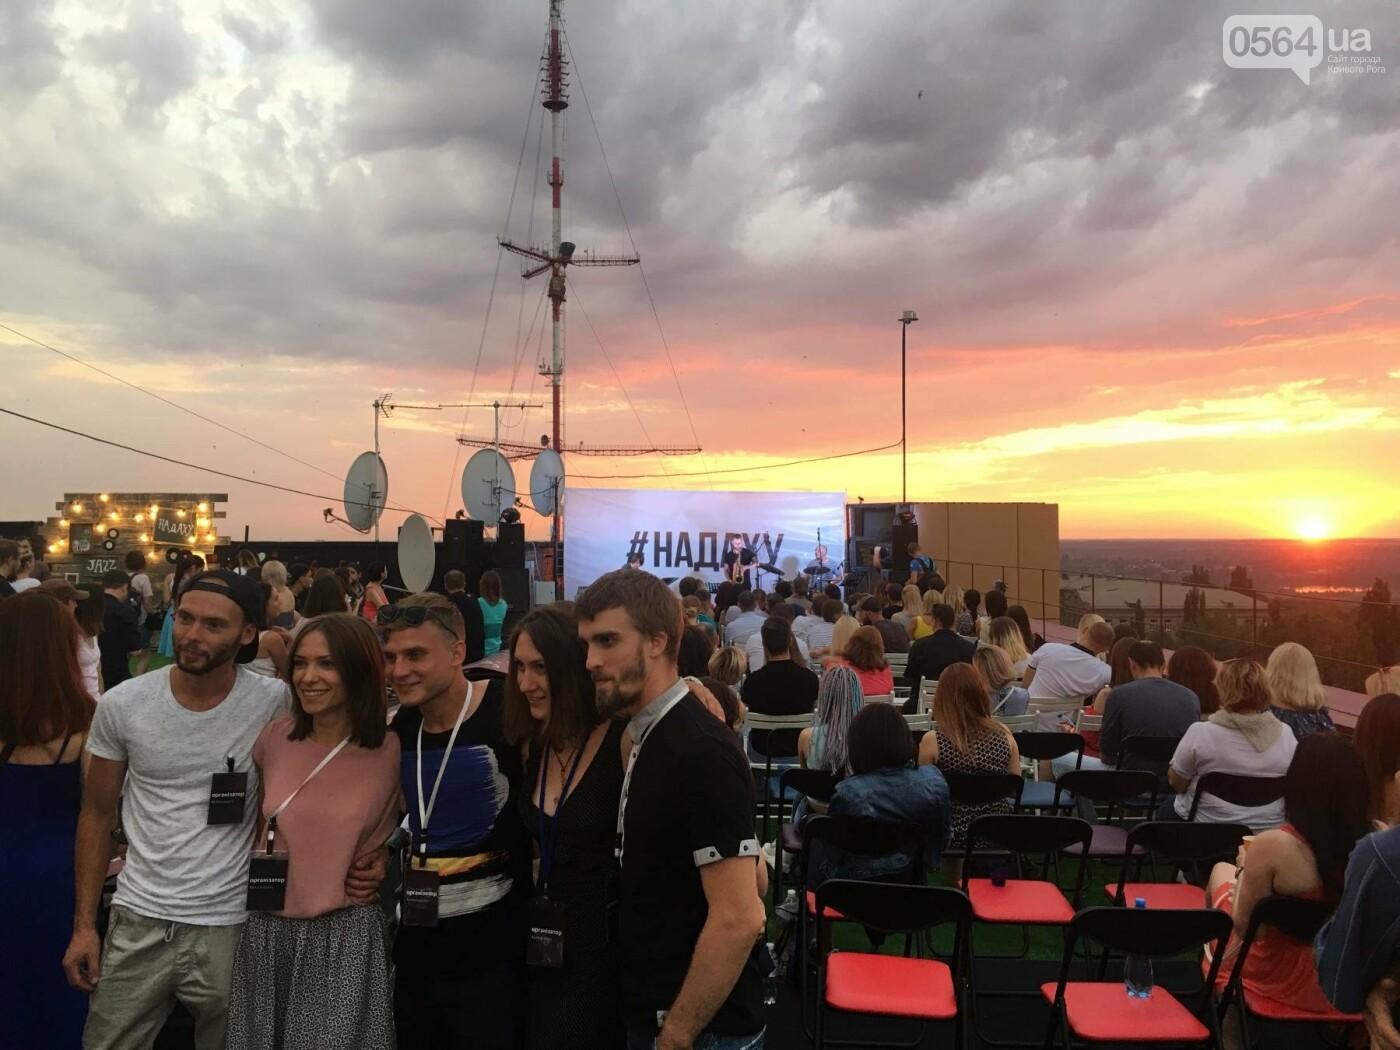 Сотни криворожан встречали закат на крыше отеля под мелодии джаза, - ФОТО, ВИДЕО, фото-44